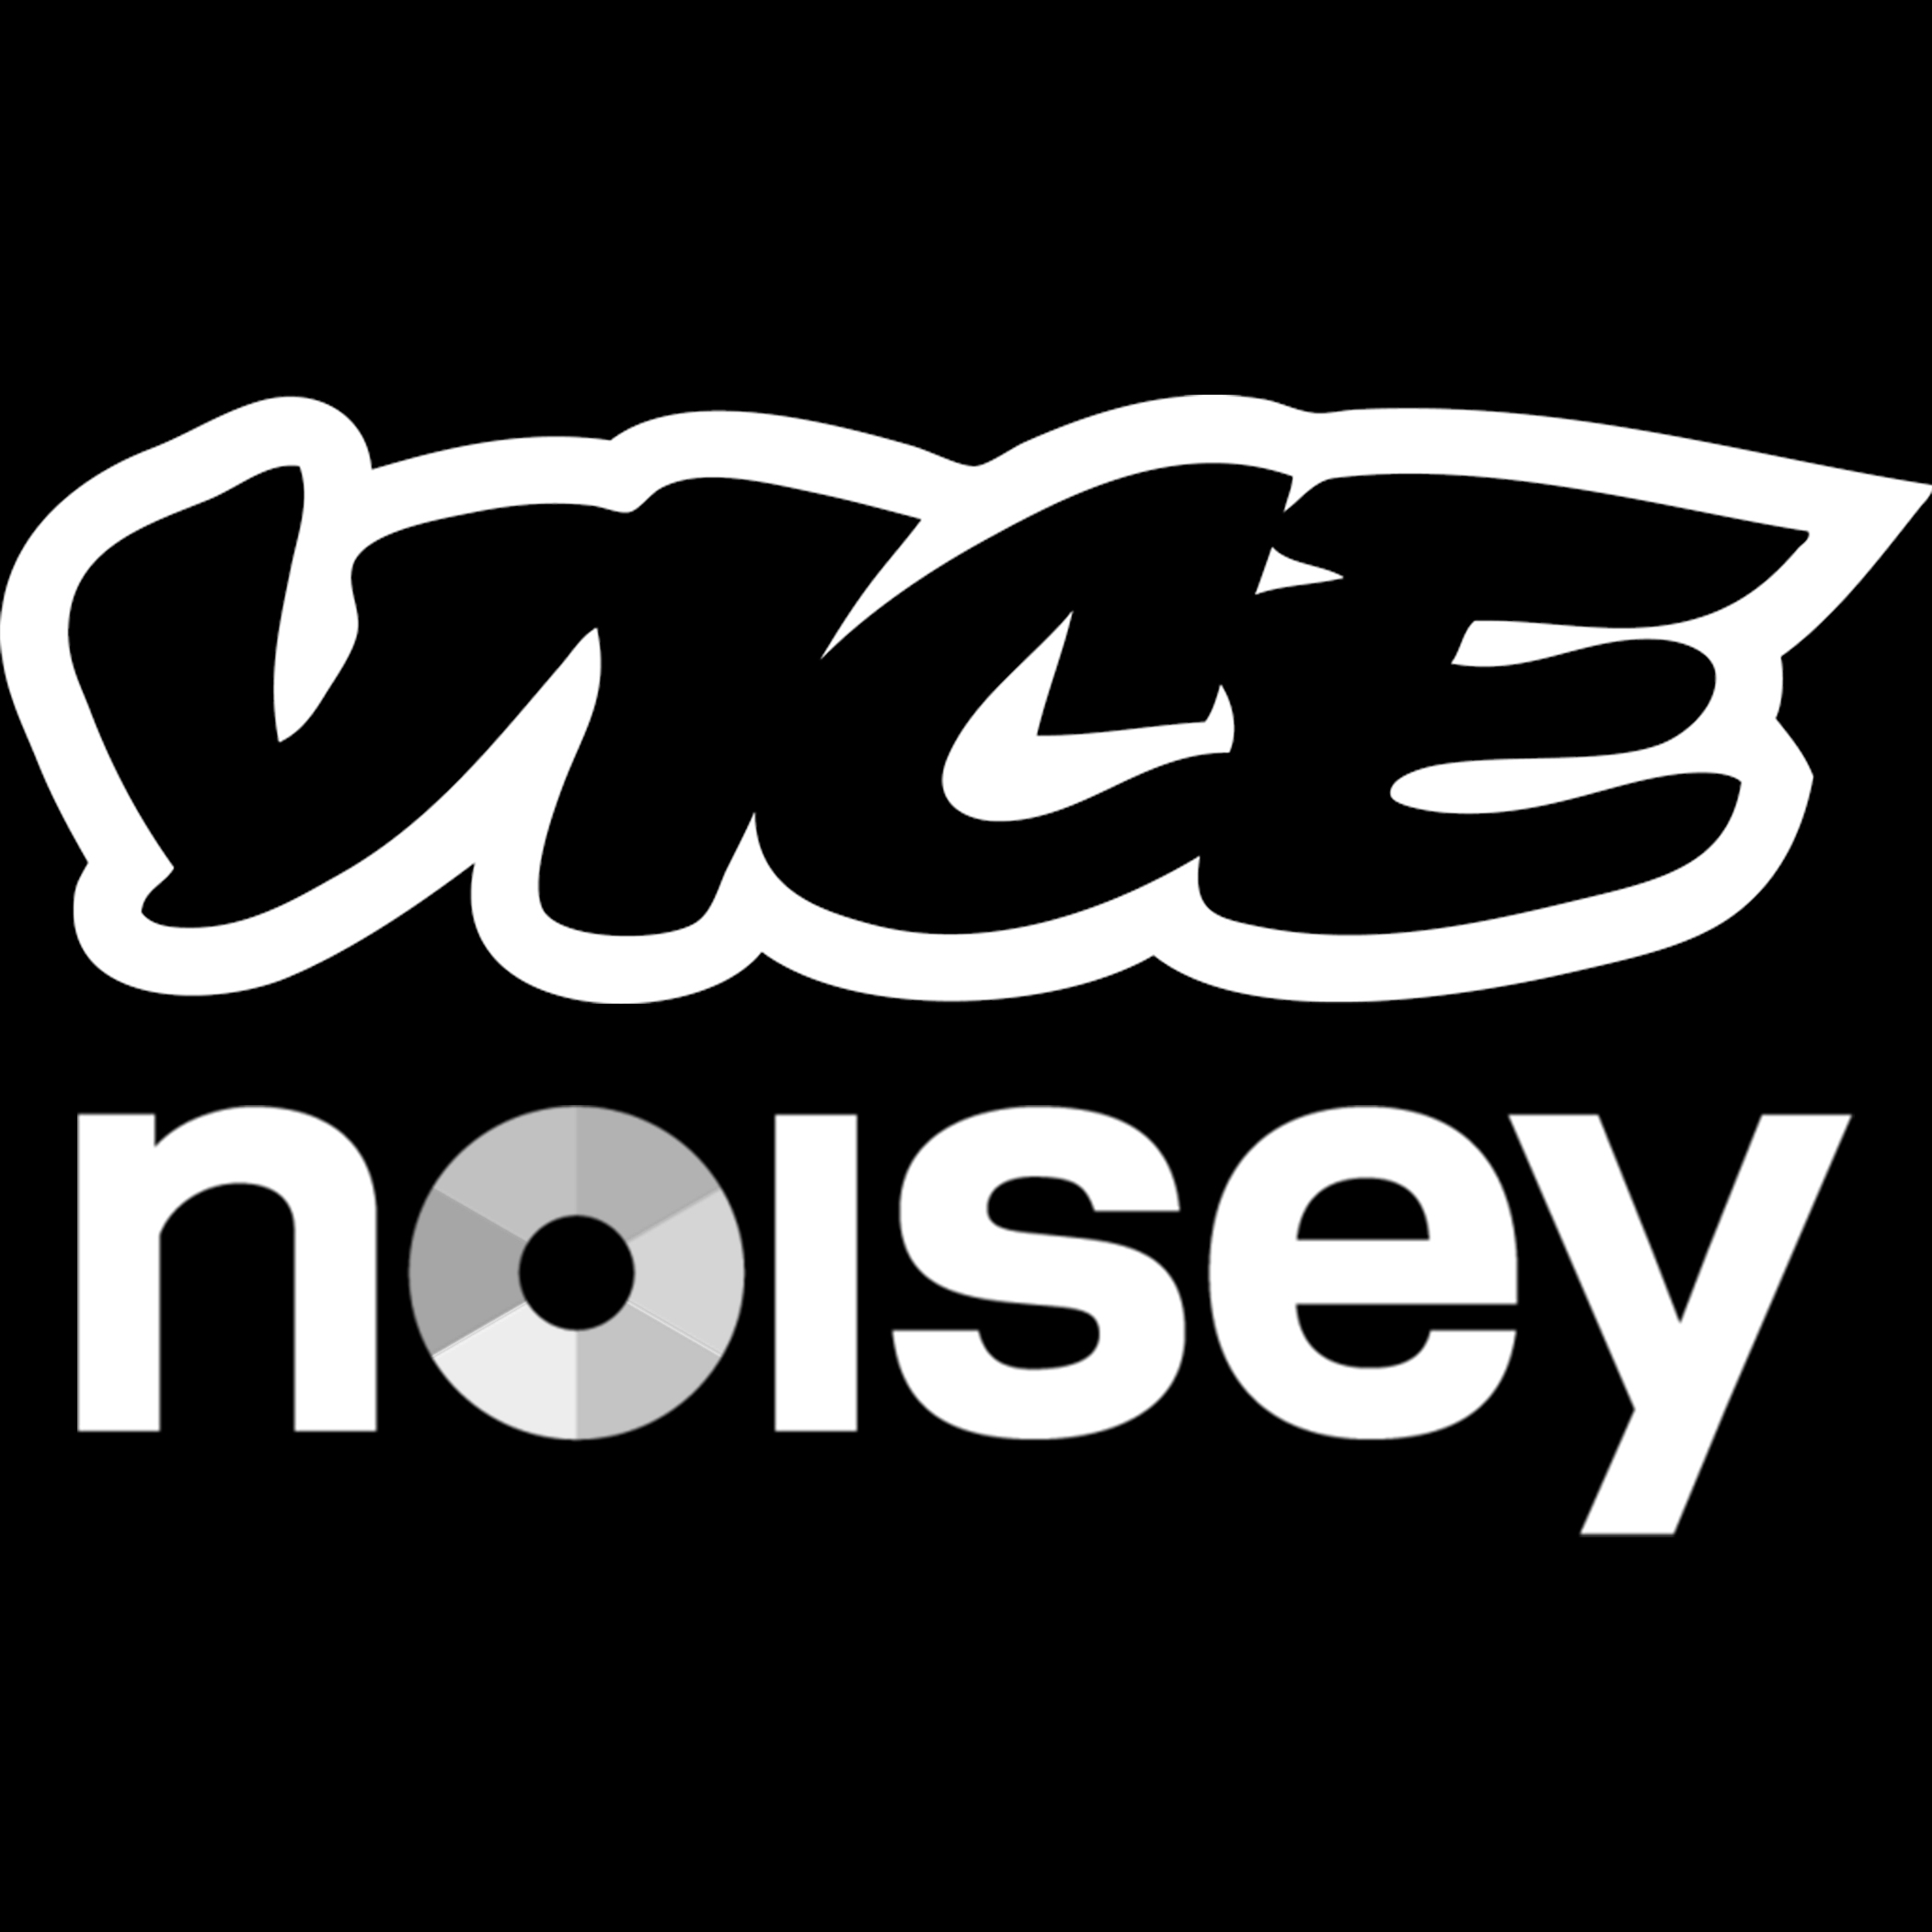 ViceNoisey.jpg